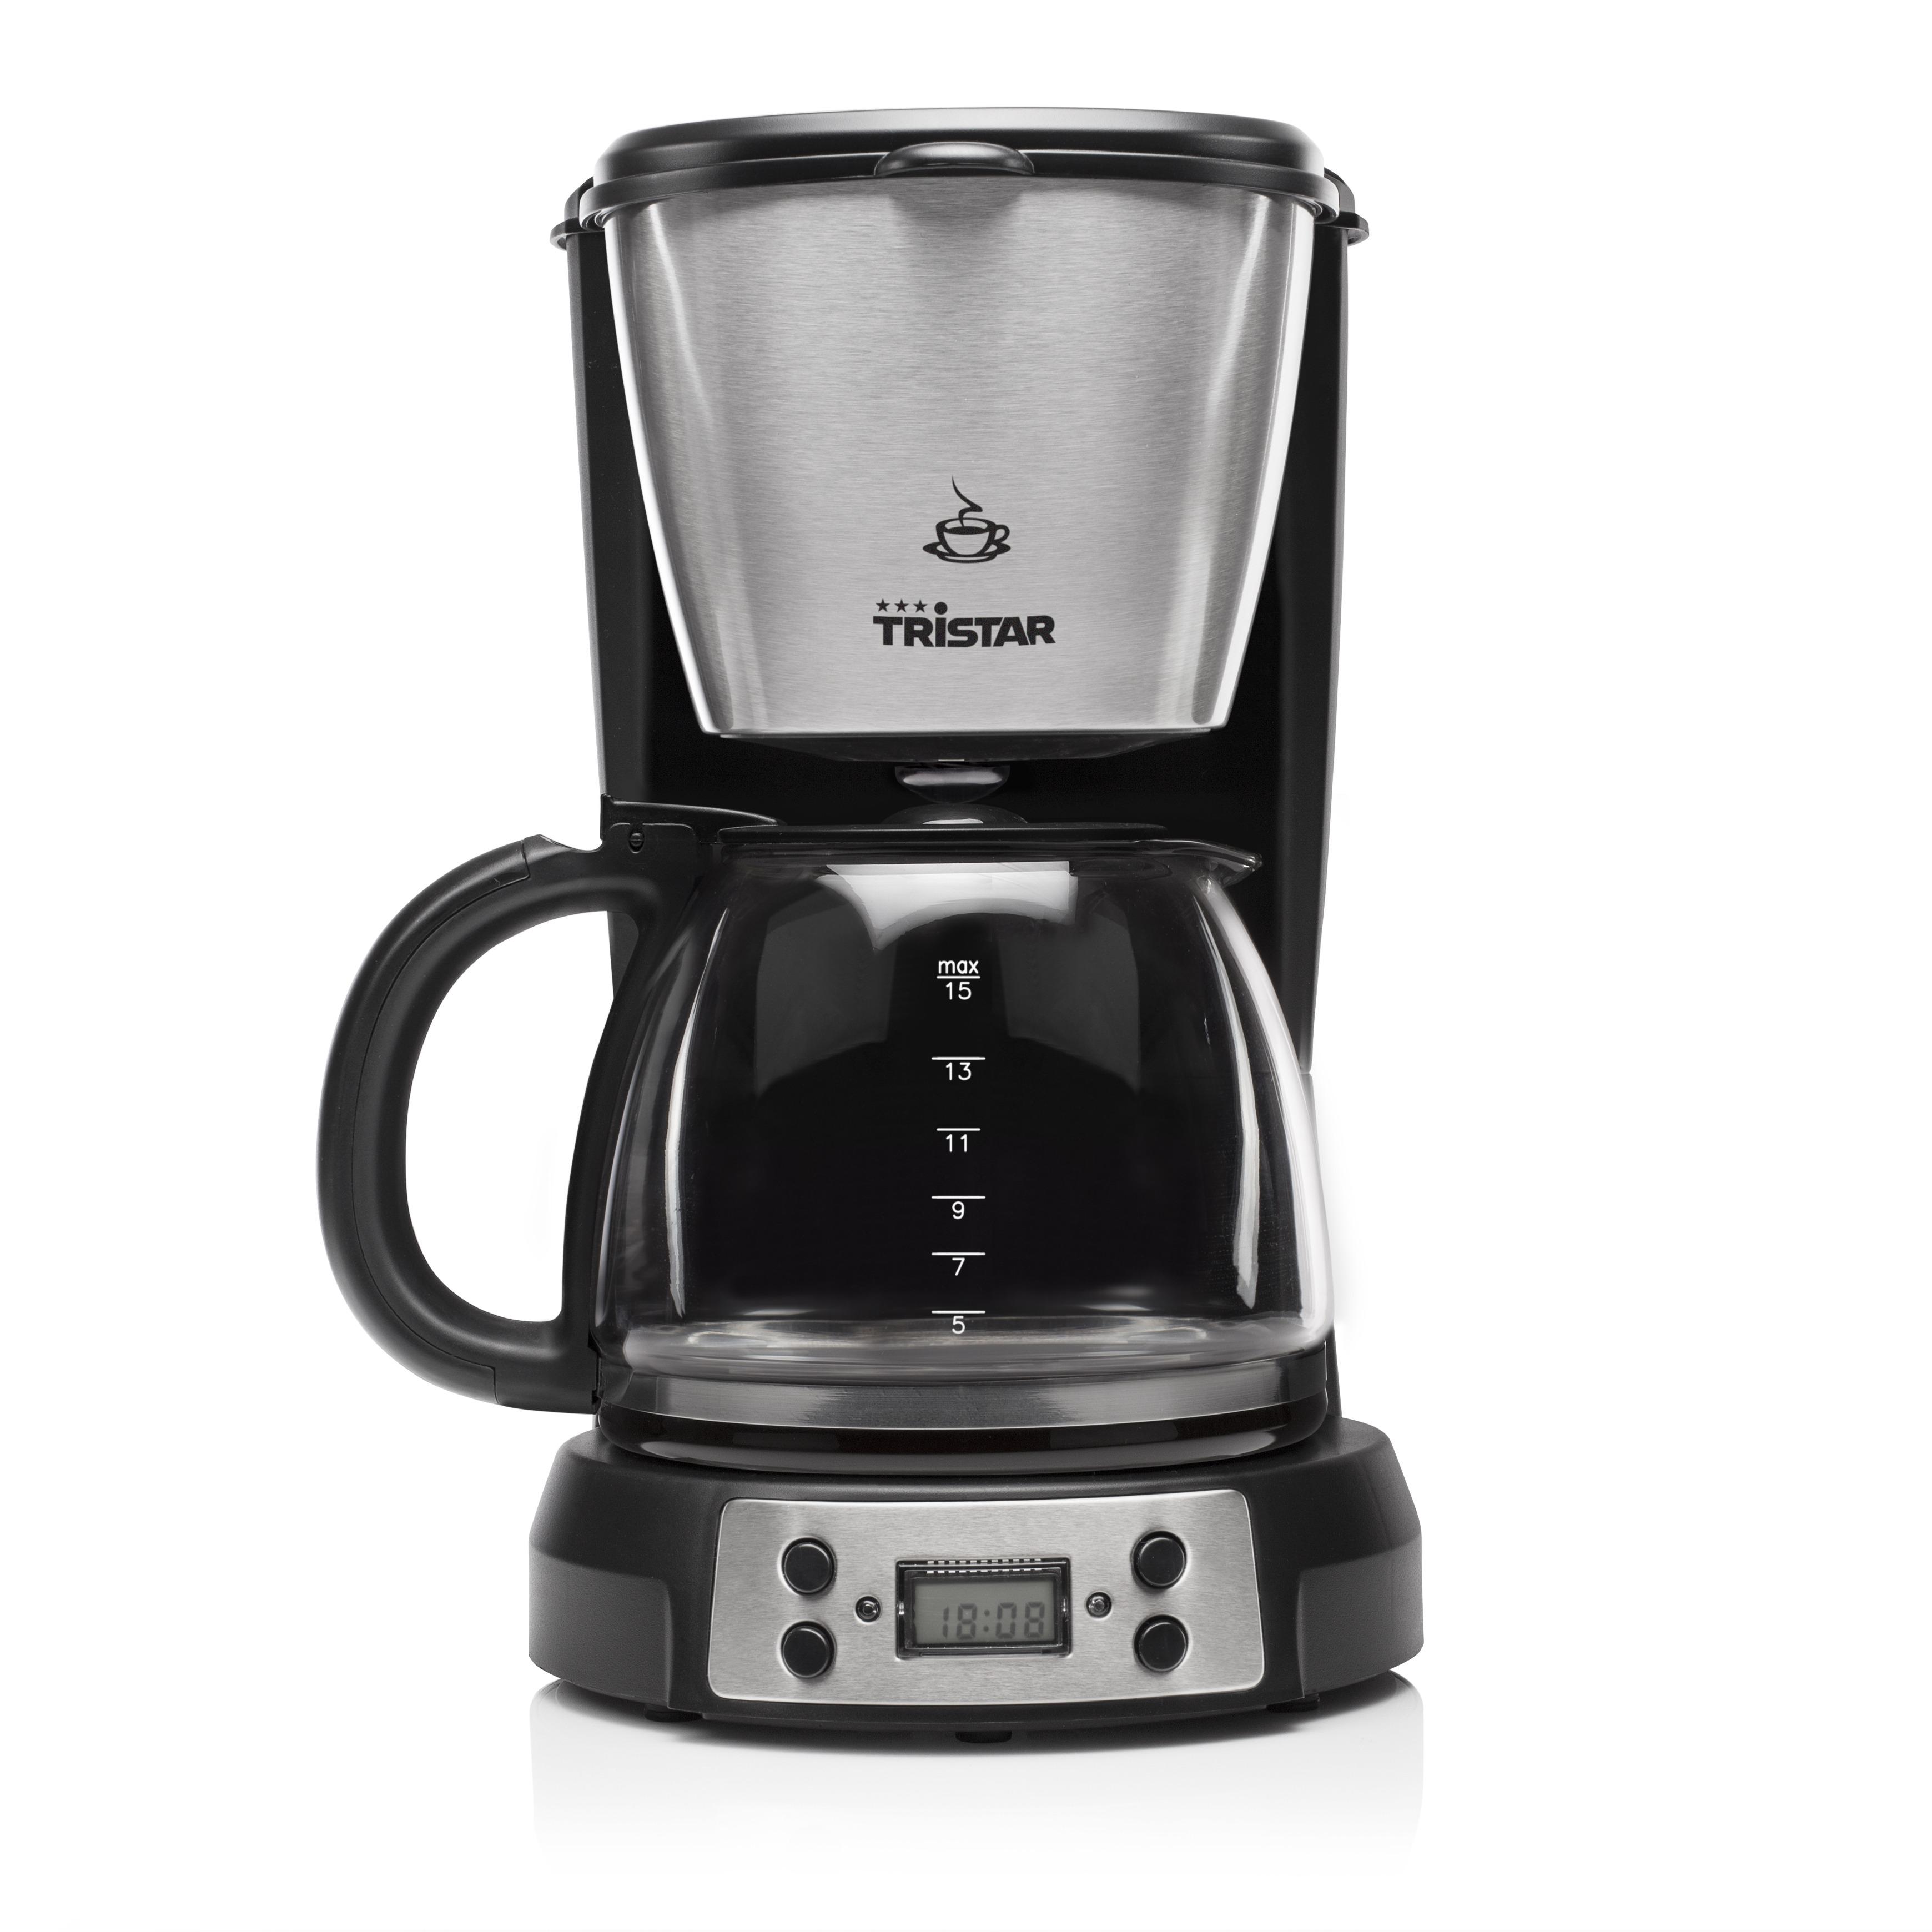 Korting Tristar CM1248 koffiefilter apparaat